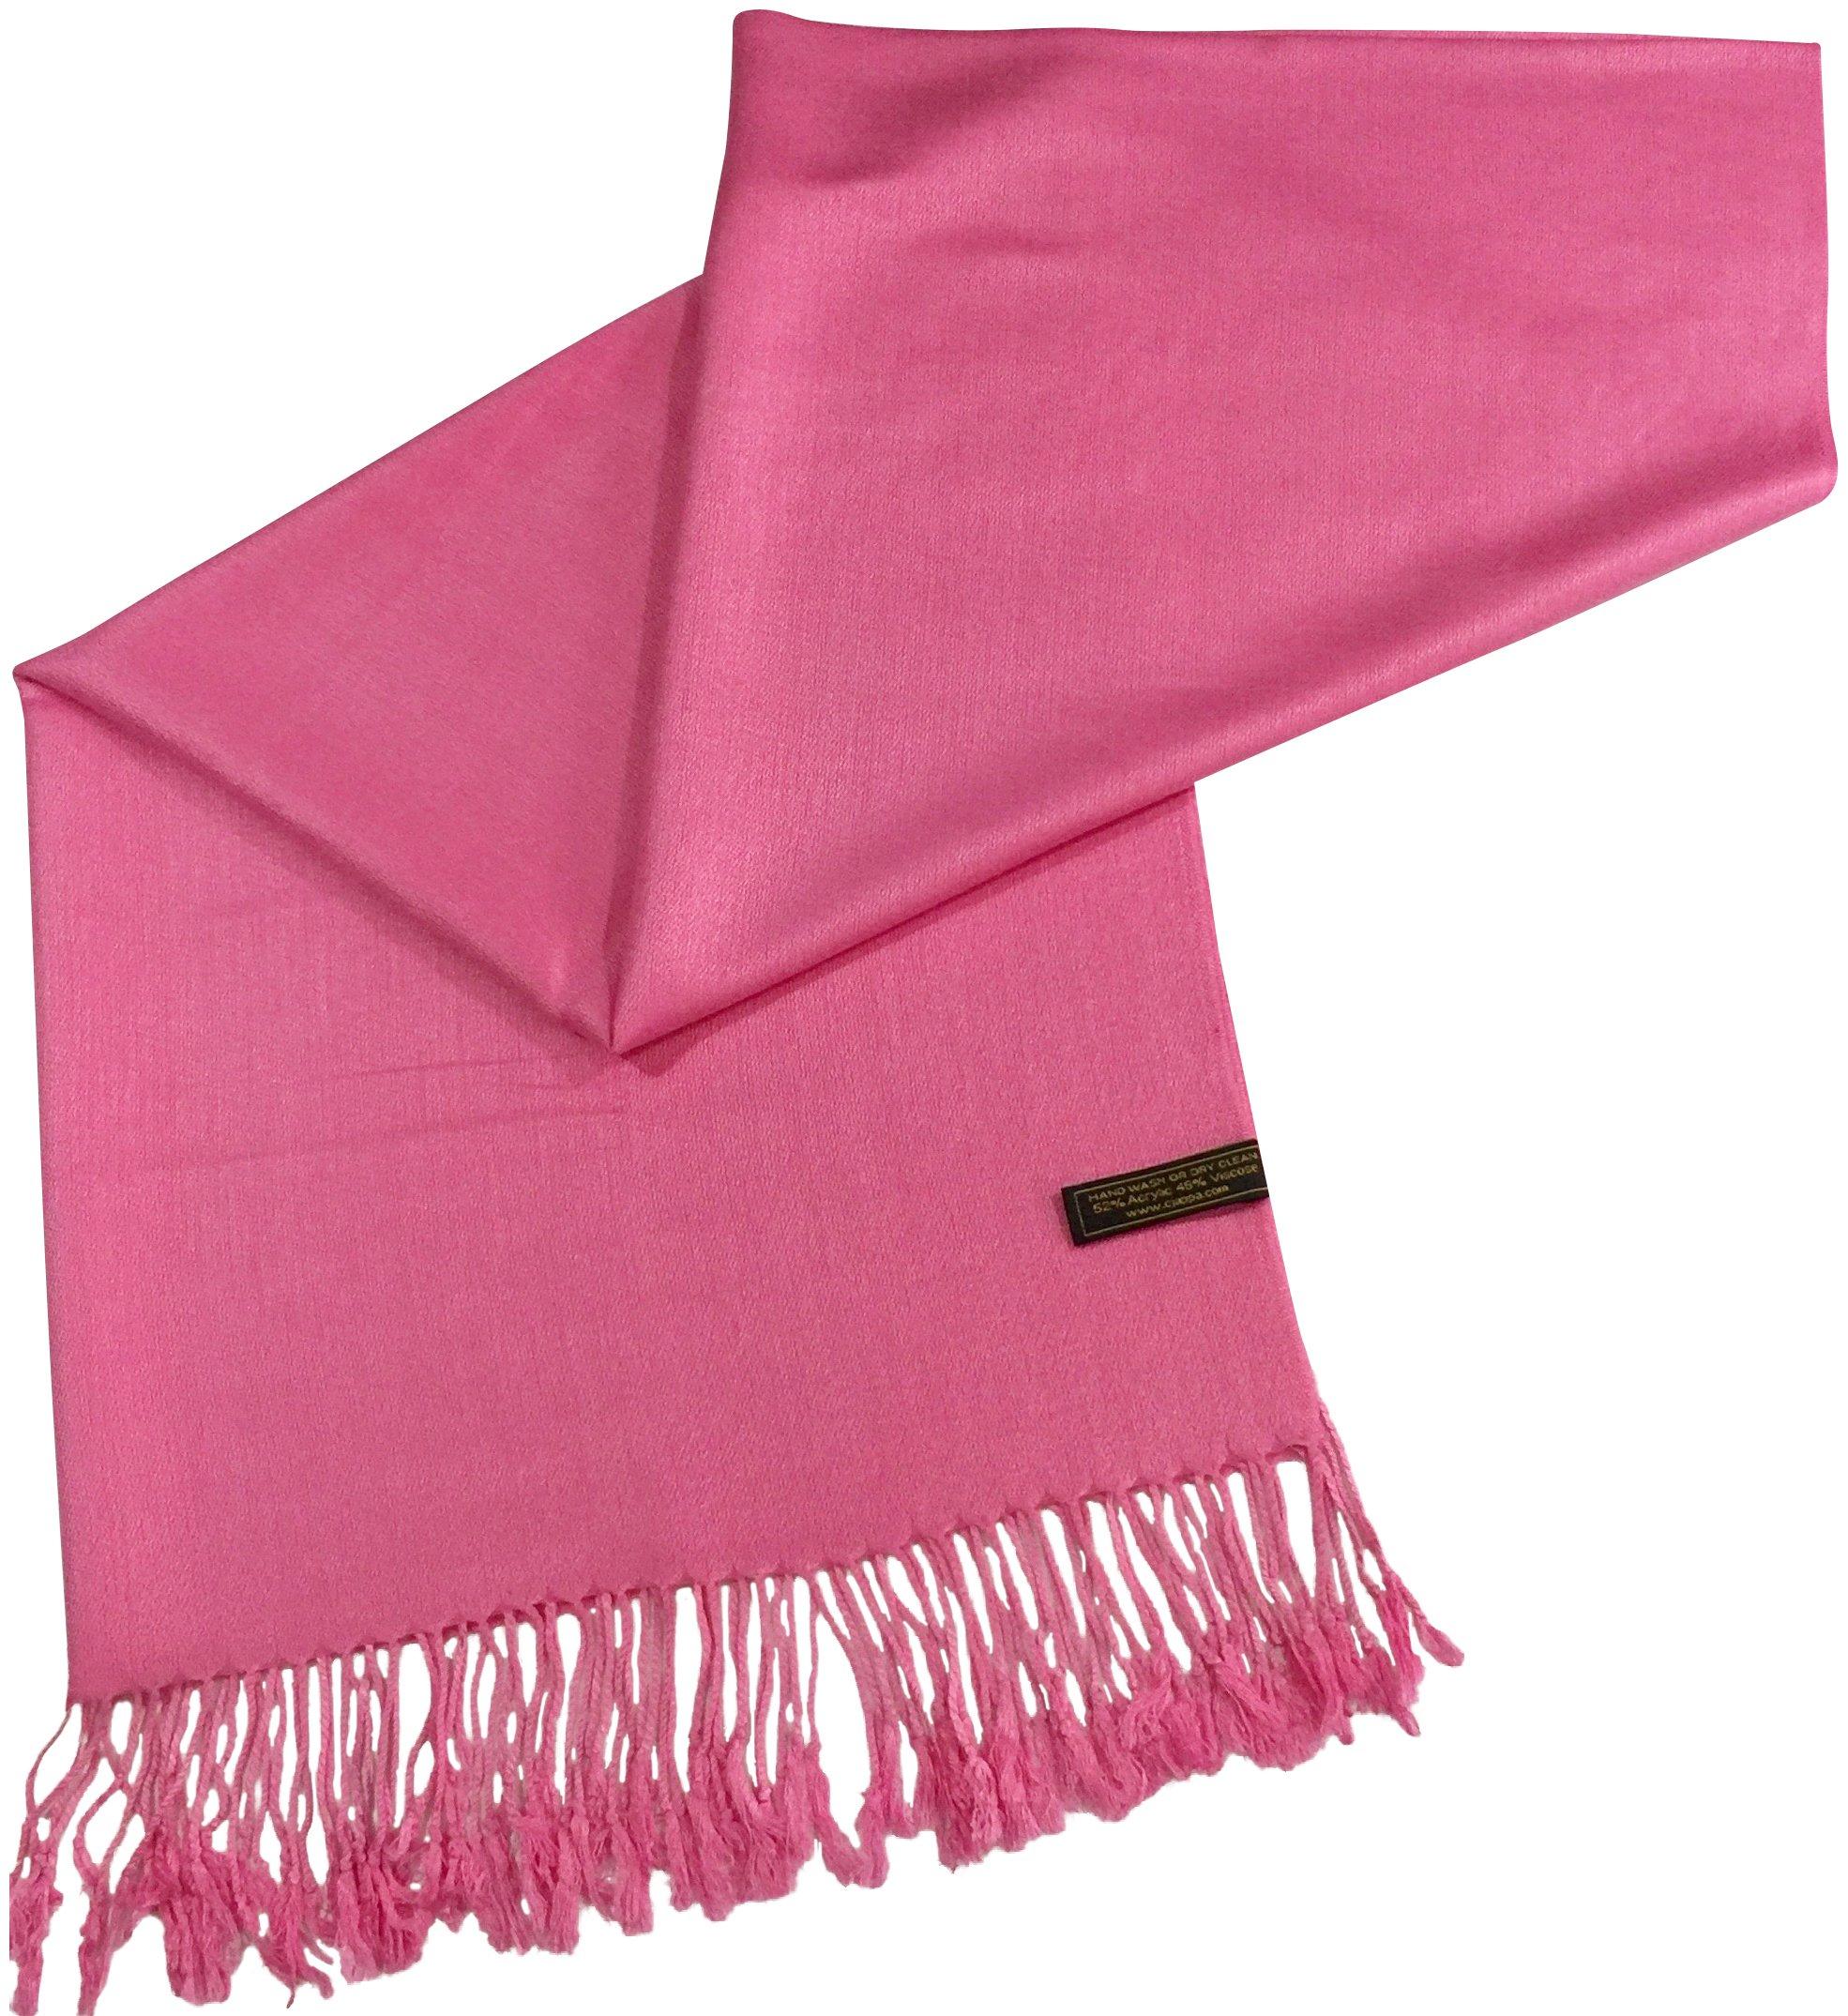 CJ Apparel Pink Solid Color Design Shawl Scarf Wrap Stole Pashmina SecondsNEW